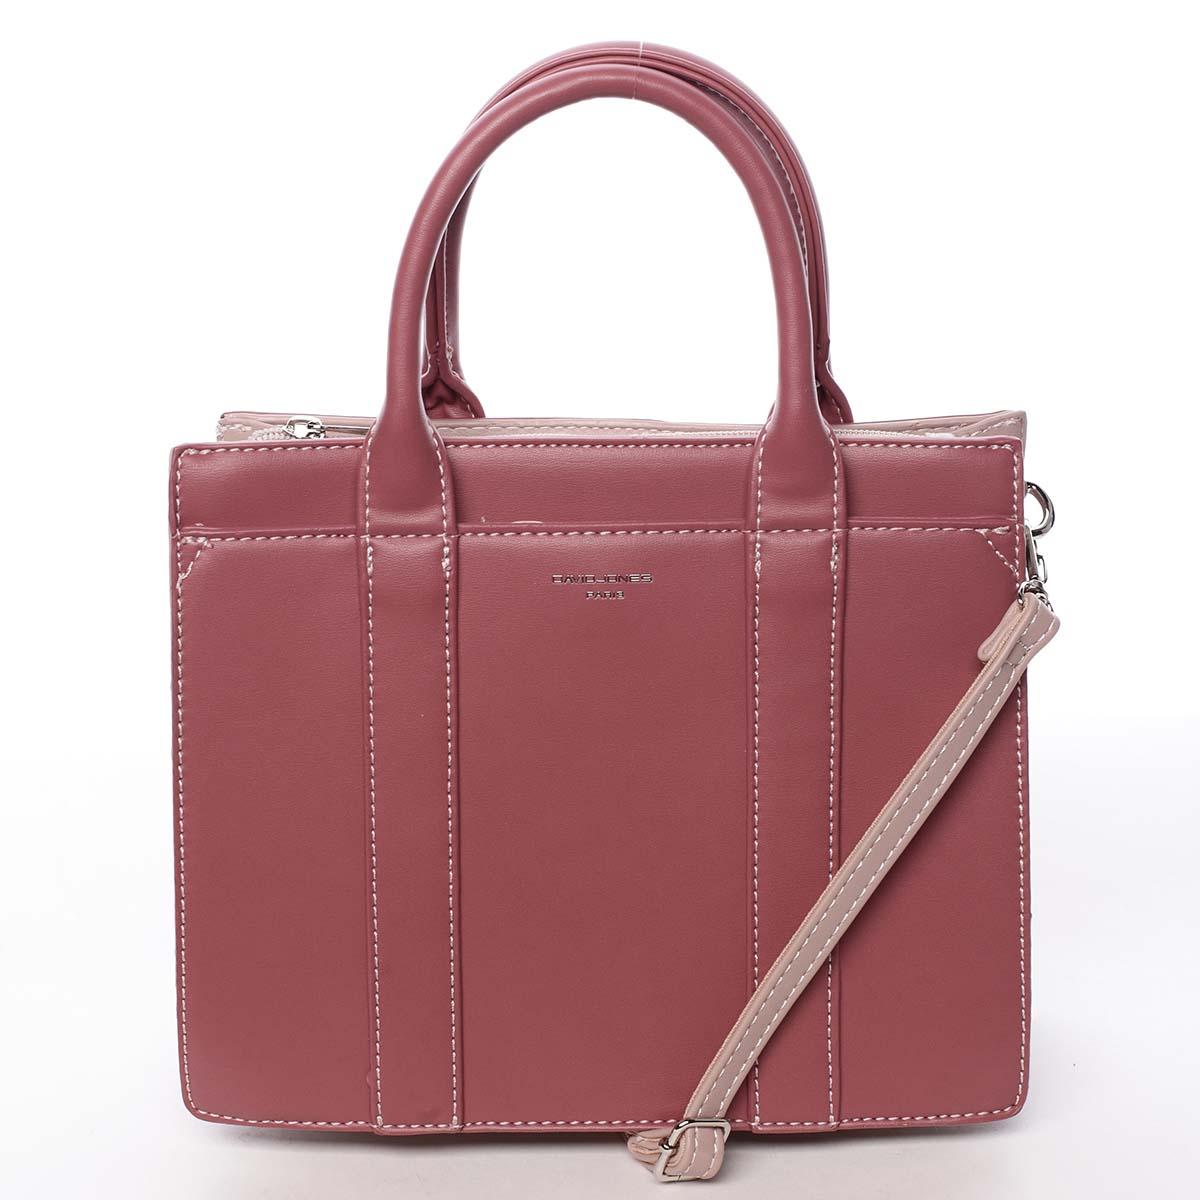 Malá dámská kabelka do ruky tmavě růžová - David Jones Akiba